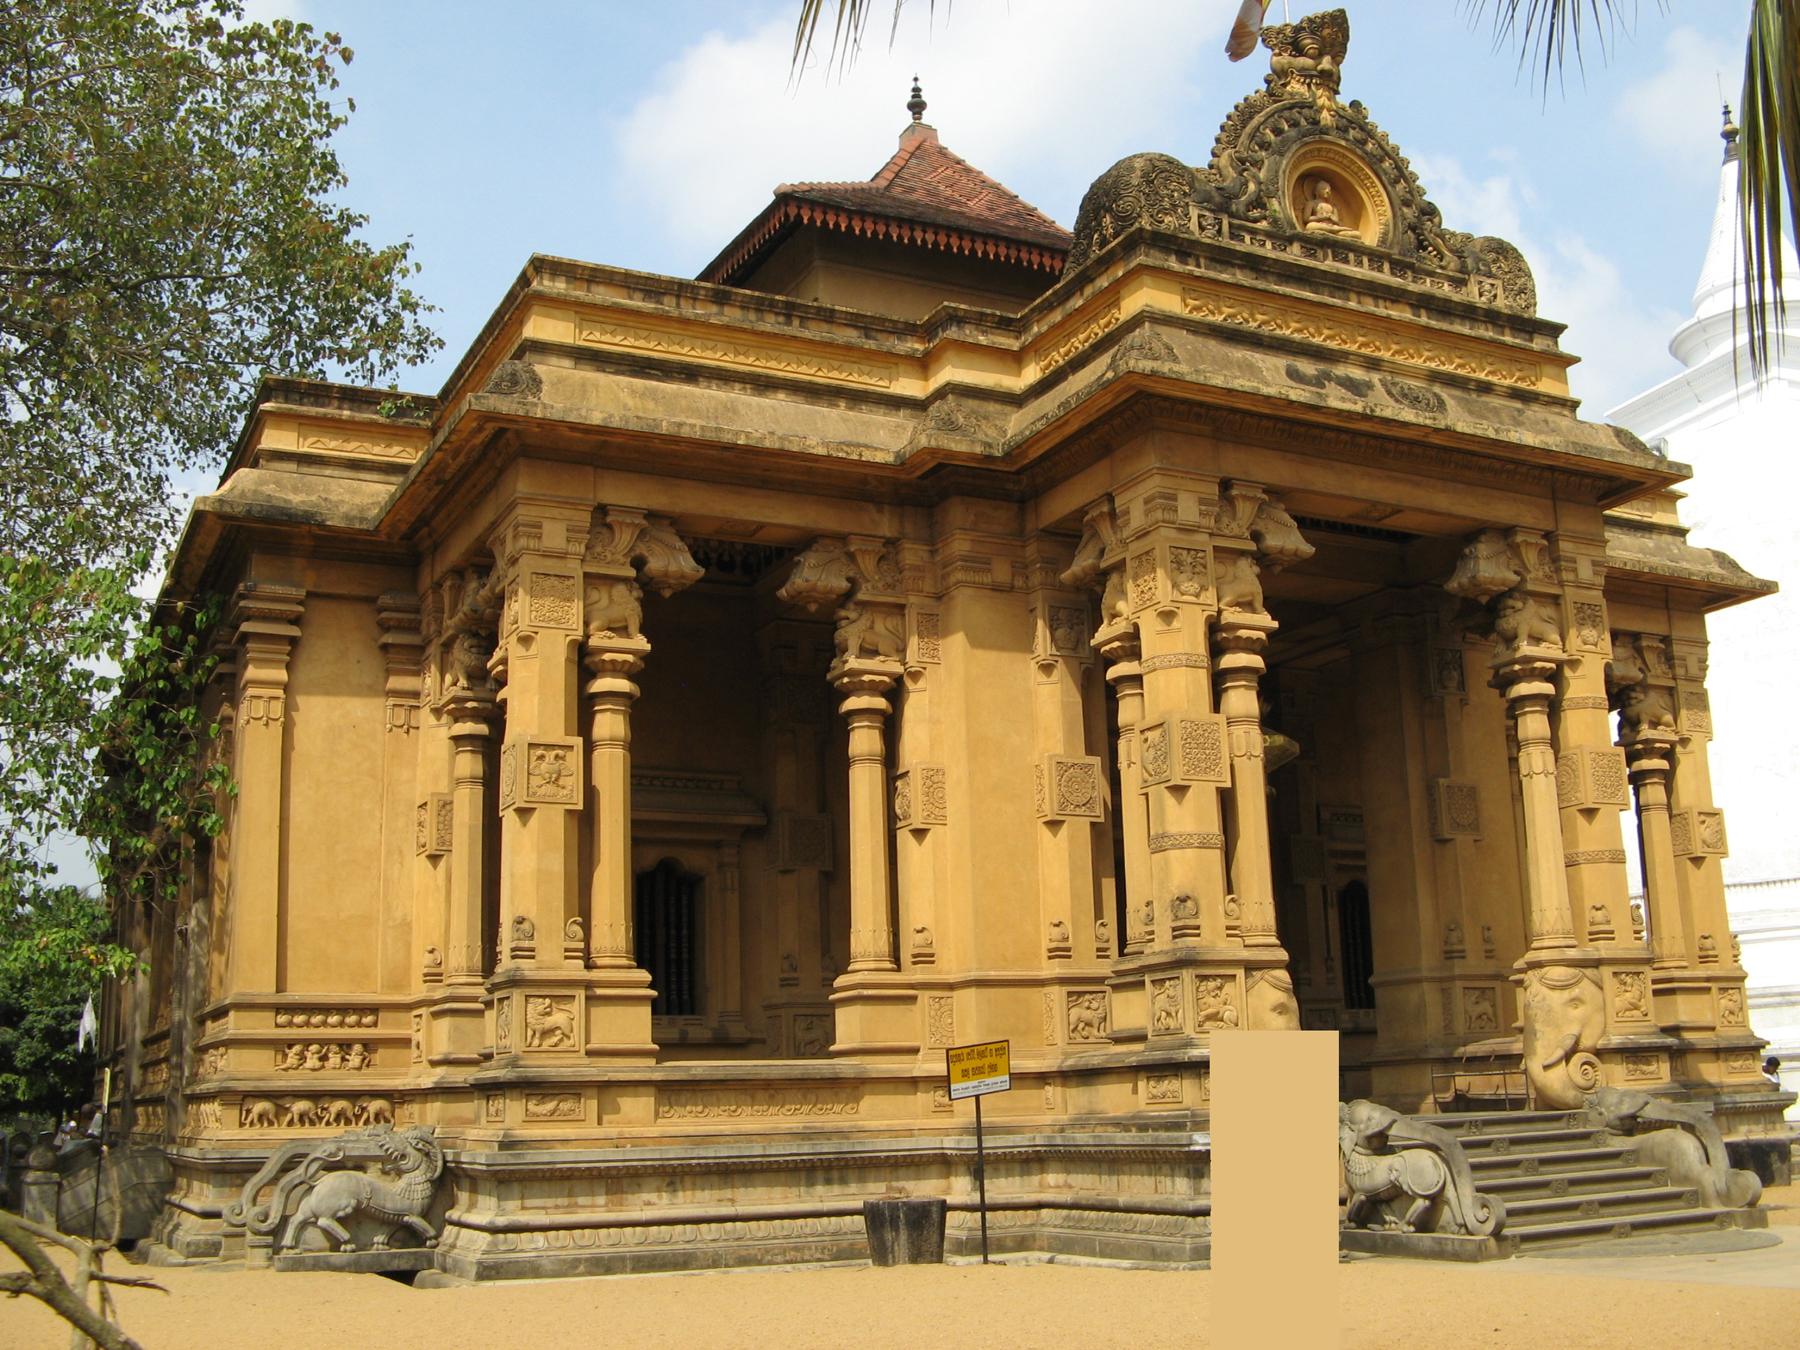 Храма Вихара Маха Келания Раджа